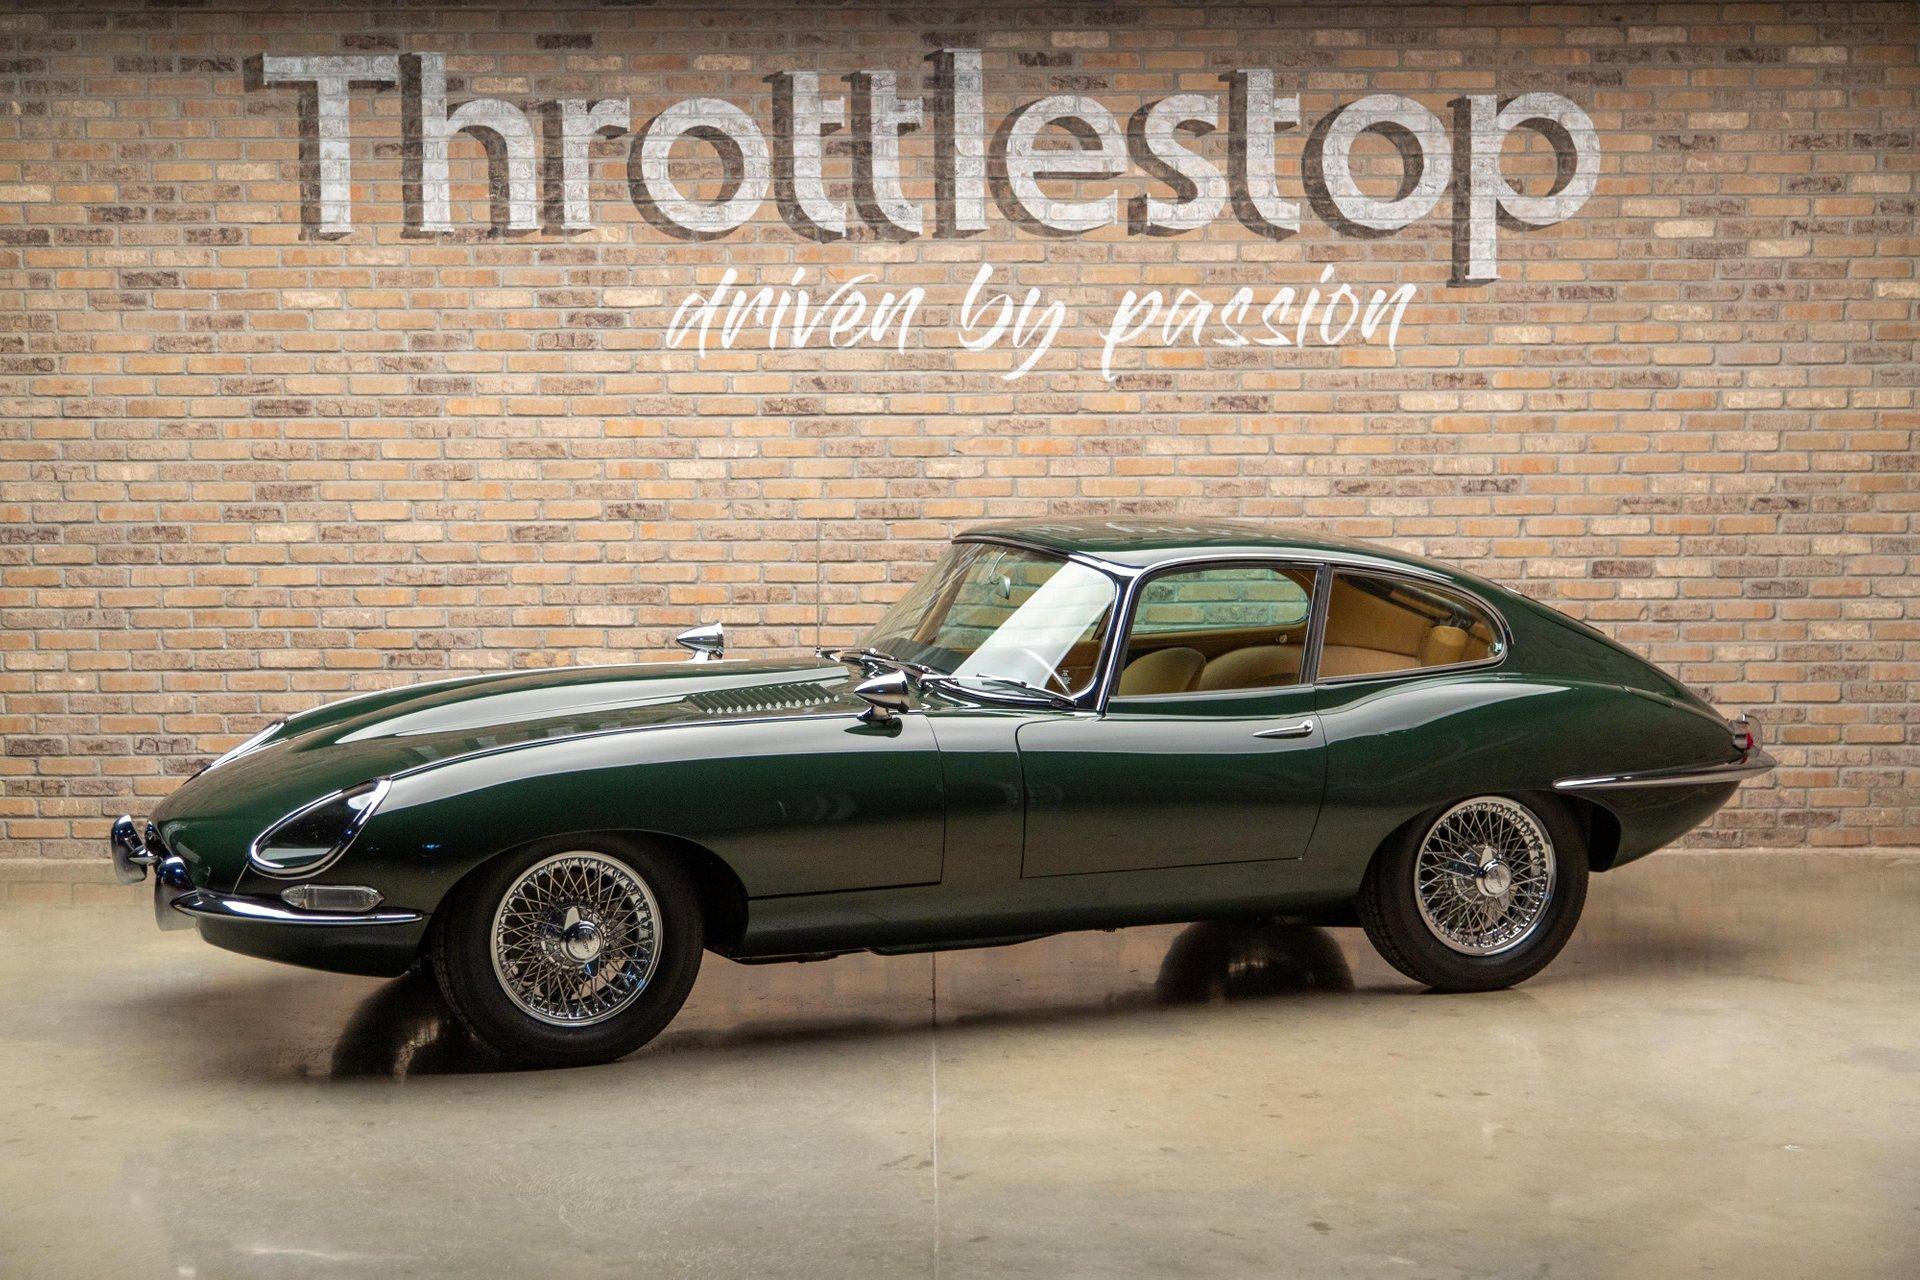 1964 jaguar e type coupe